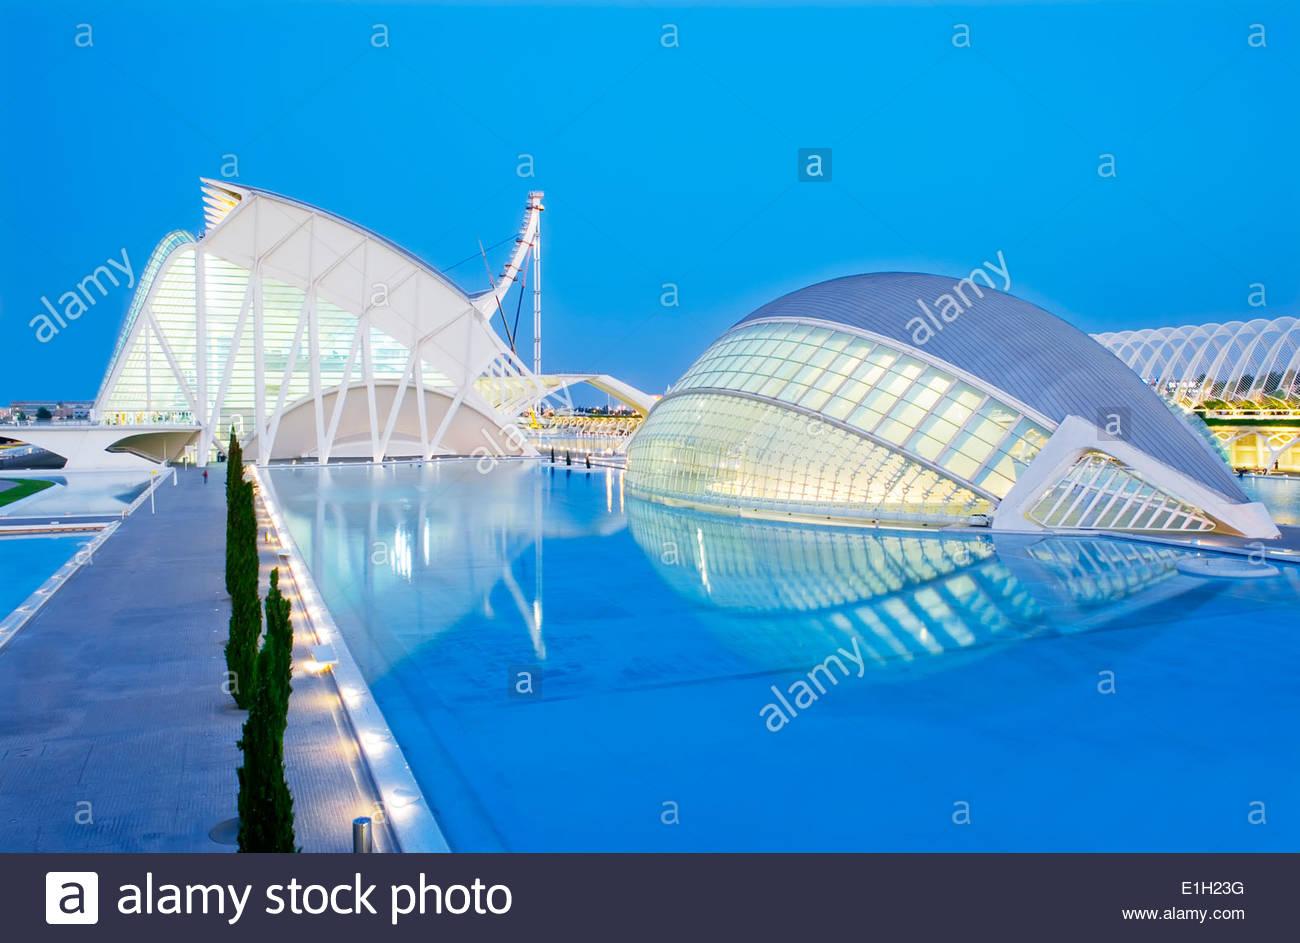 Dusk at City of Arts and Sciences, Valencia, Spain - Stock Image